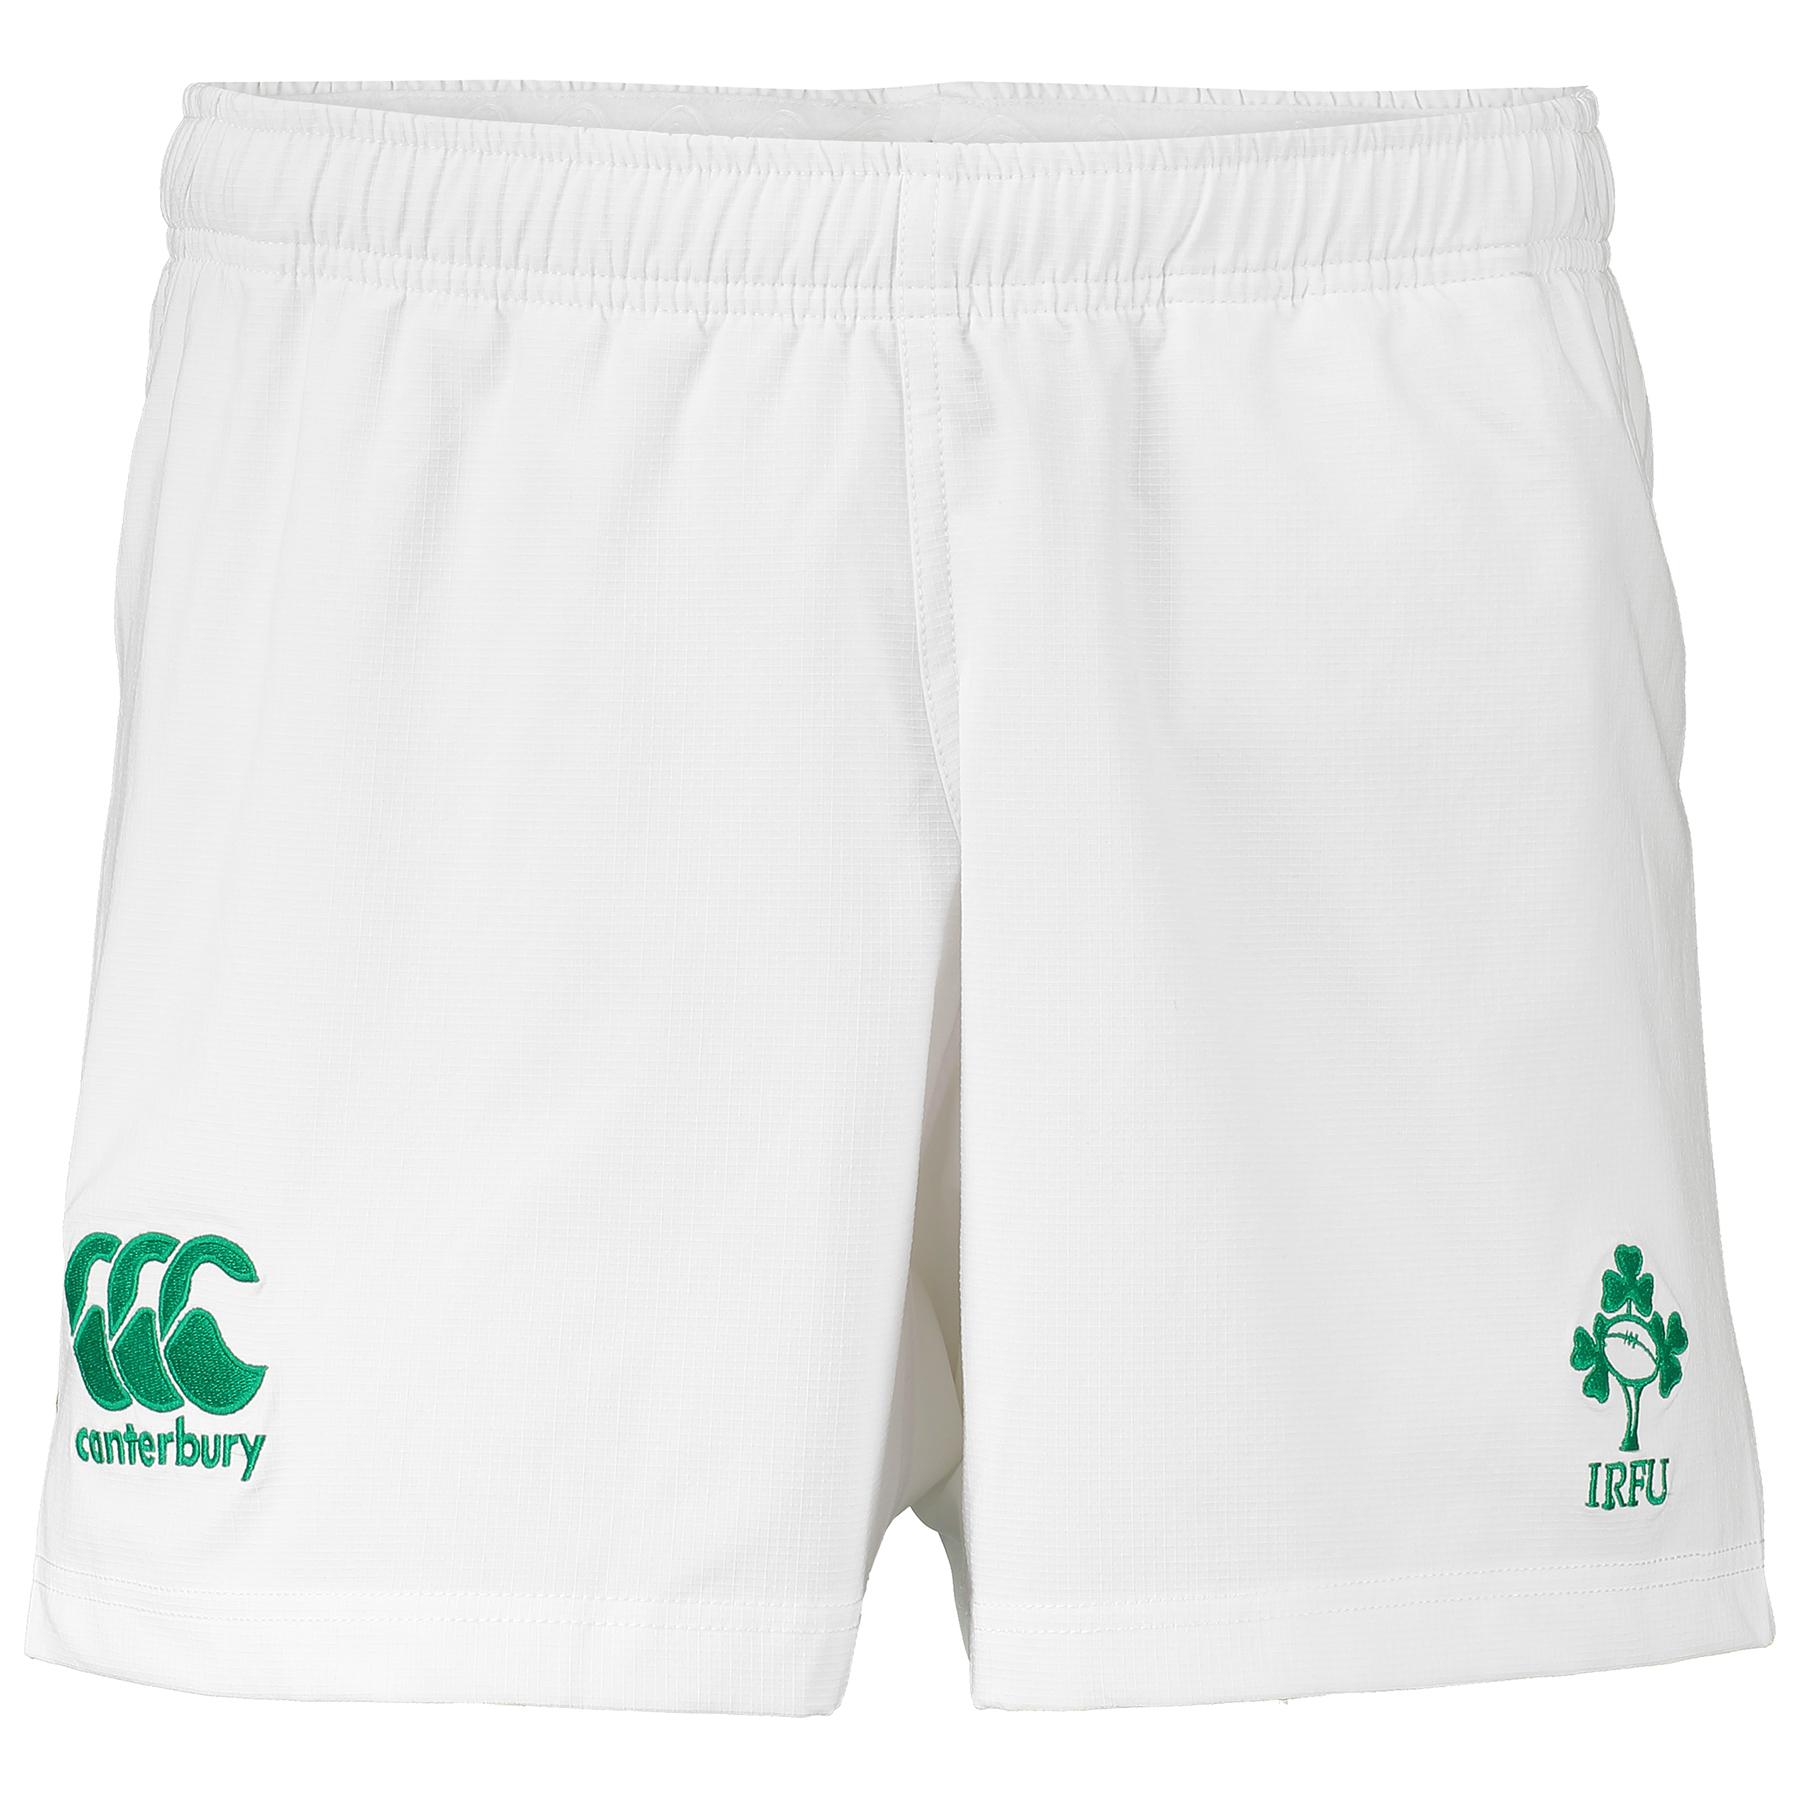 Ireland Home Short 14/15 White